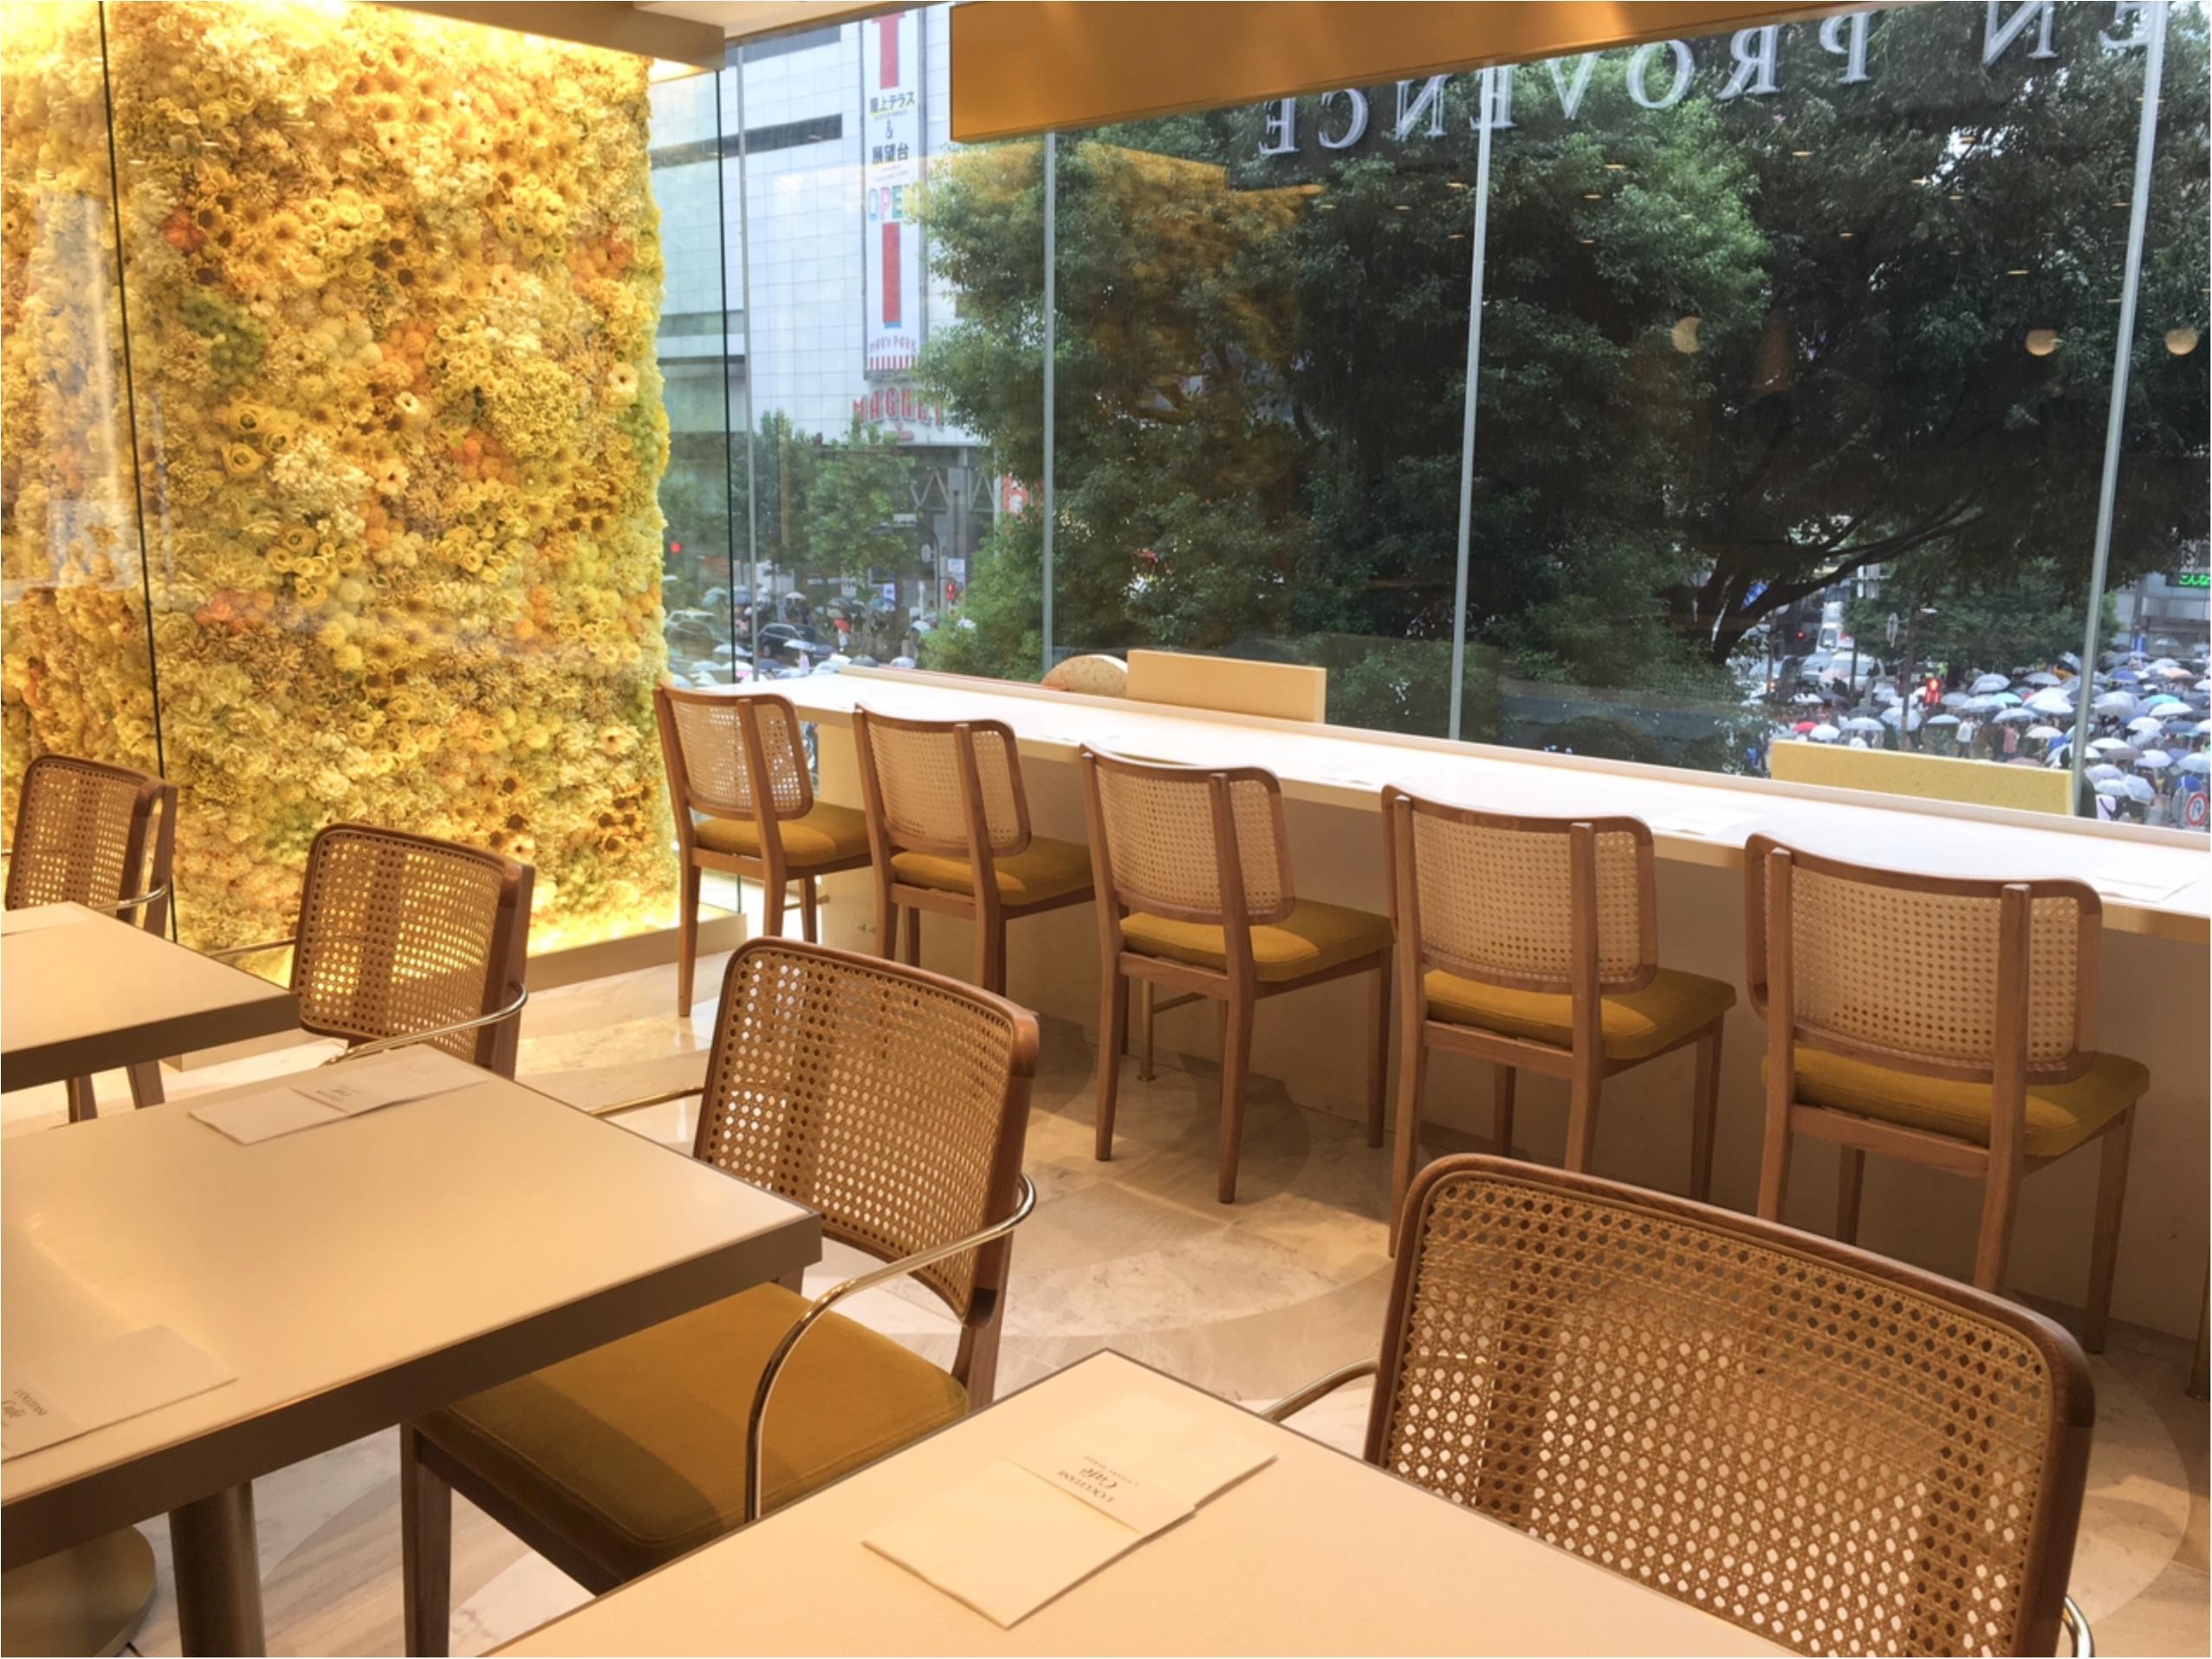 L'OCCITANE Café by Pierre Hermé(ロクシタンカフェ バイ ピエール・エルメ)へ♡_2